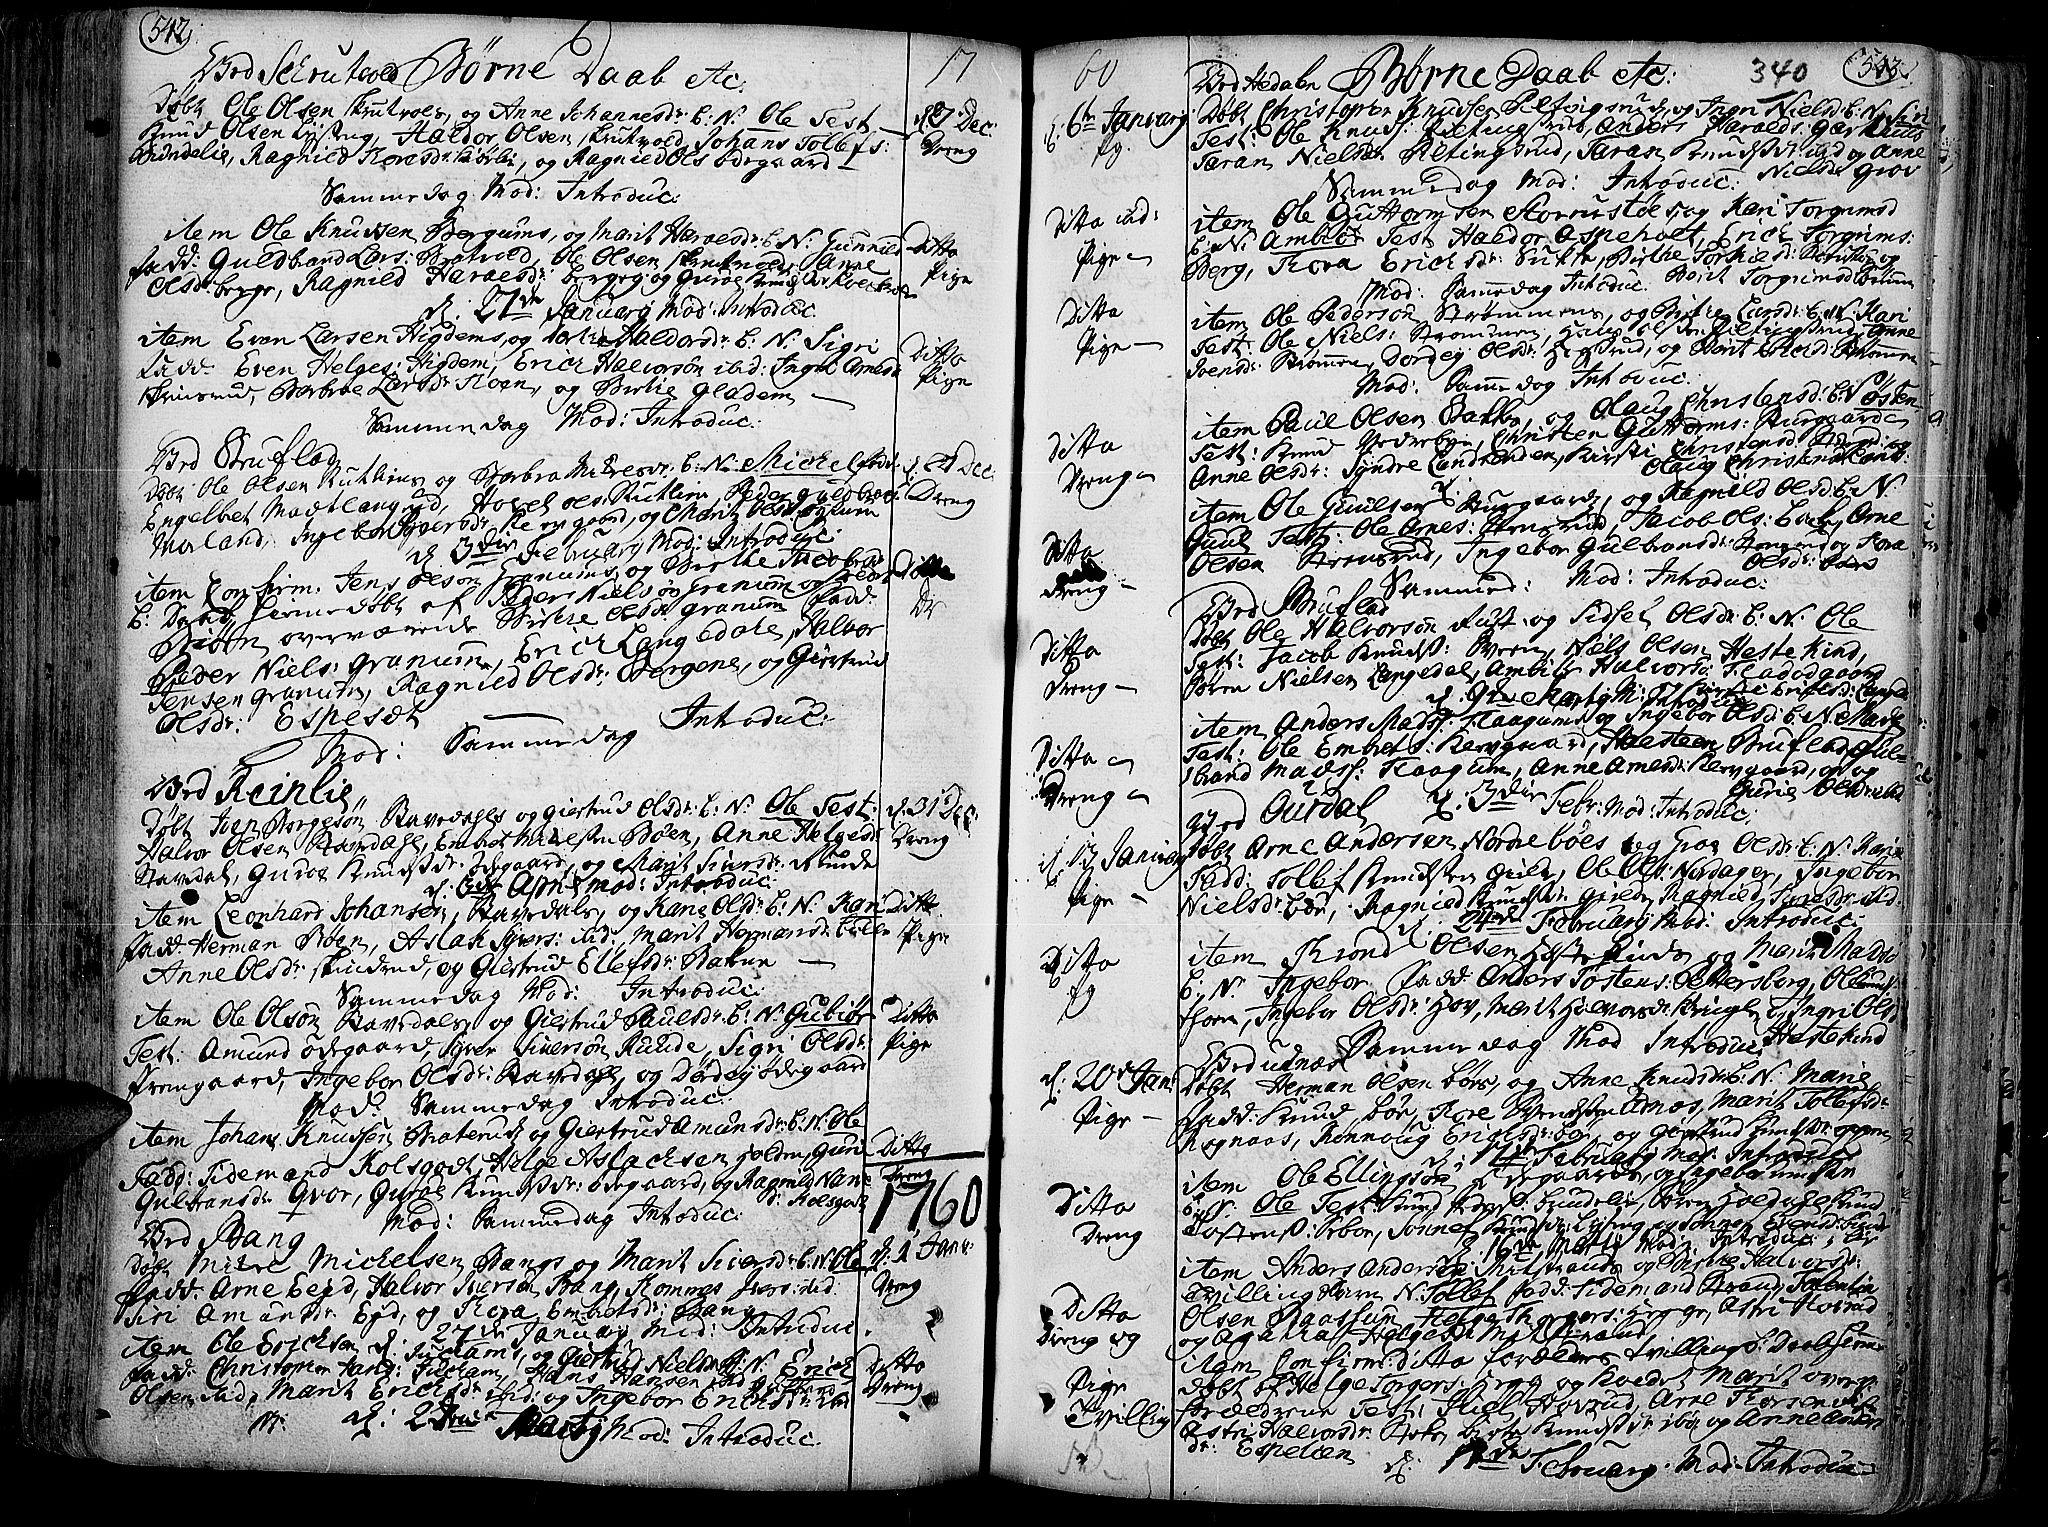 SAH, Aurdal prestekontor, Ministerialbok nr. 4, 1730-1762, s. 542-543